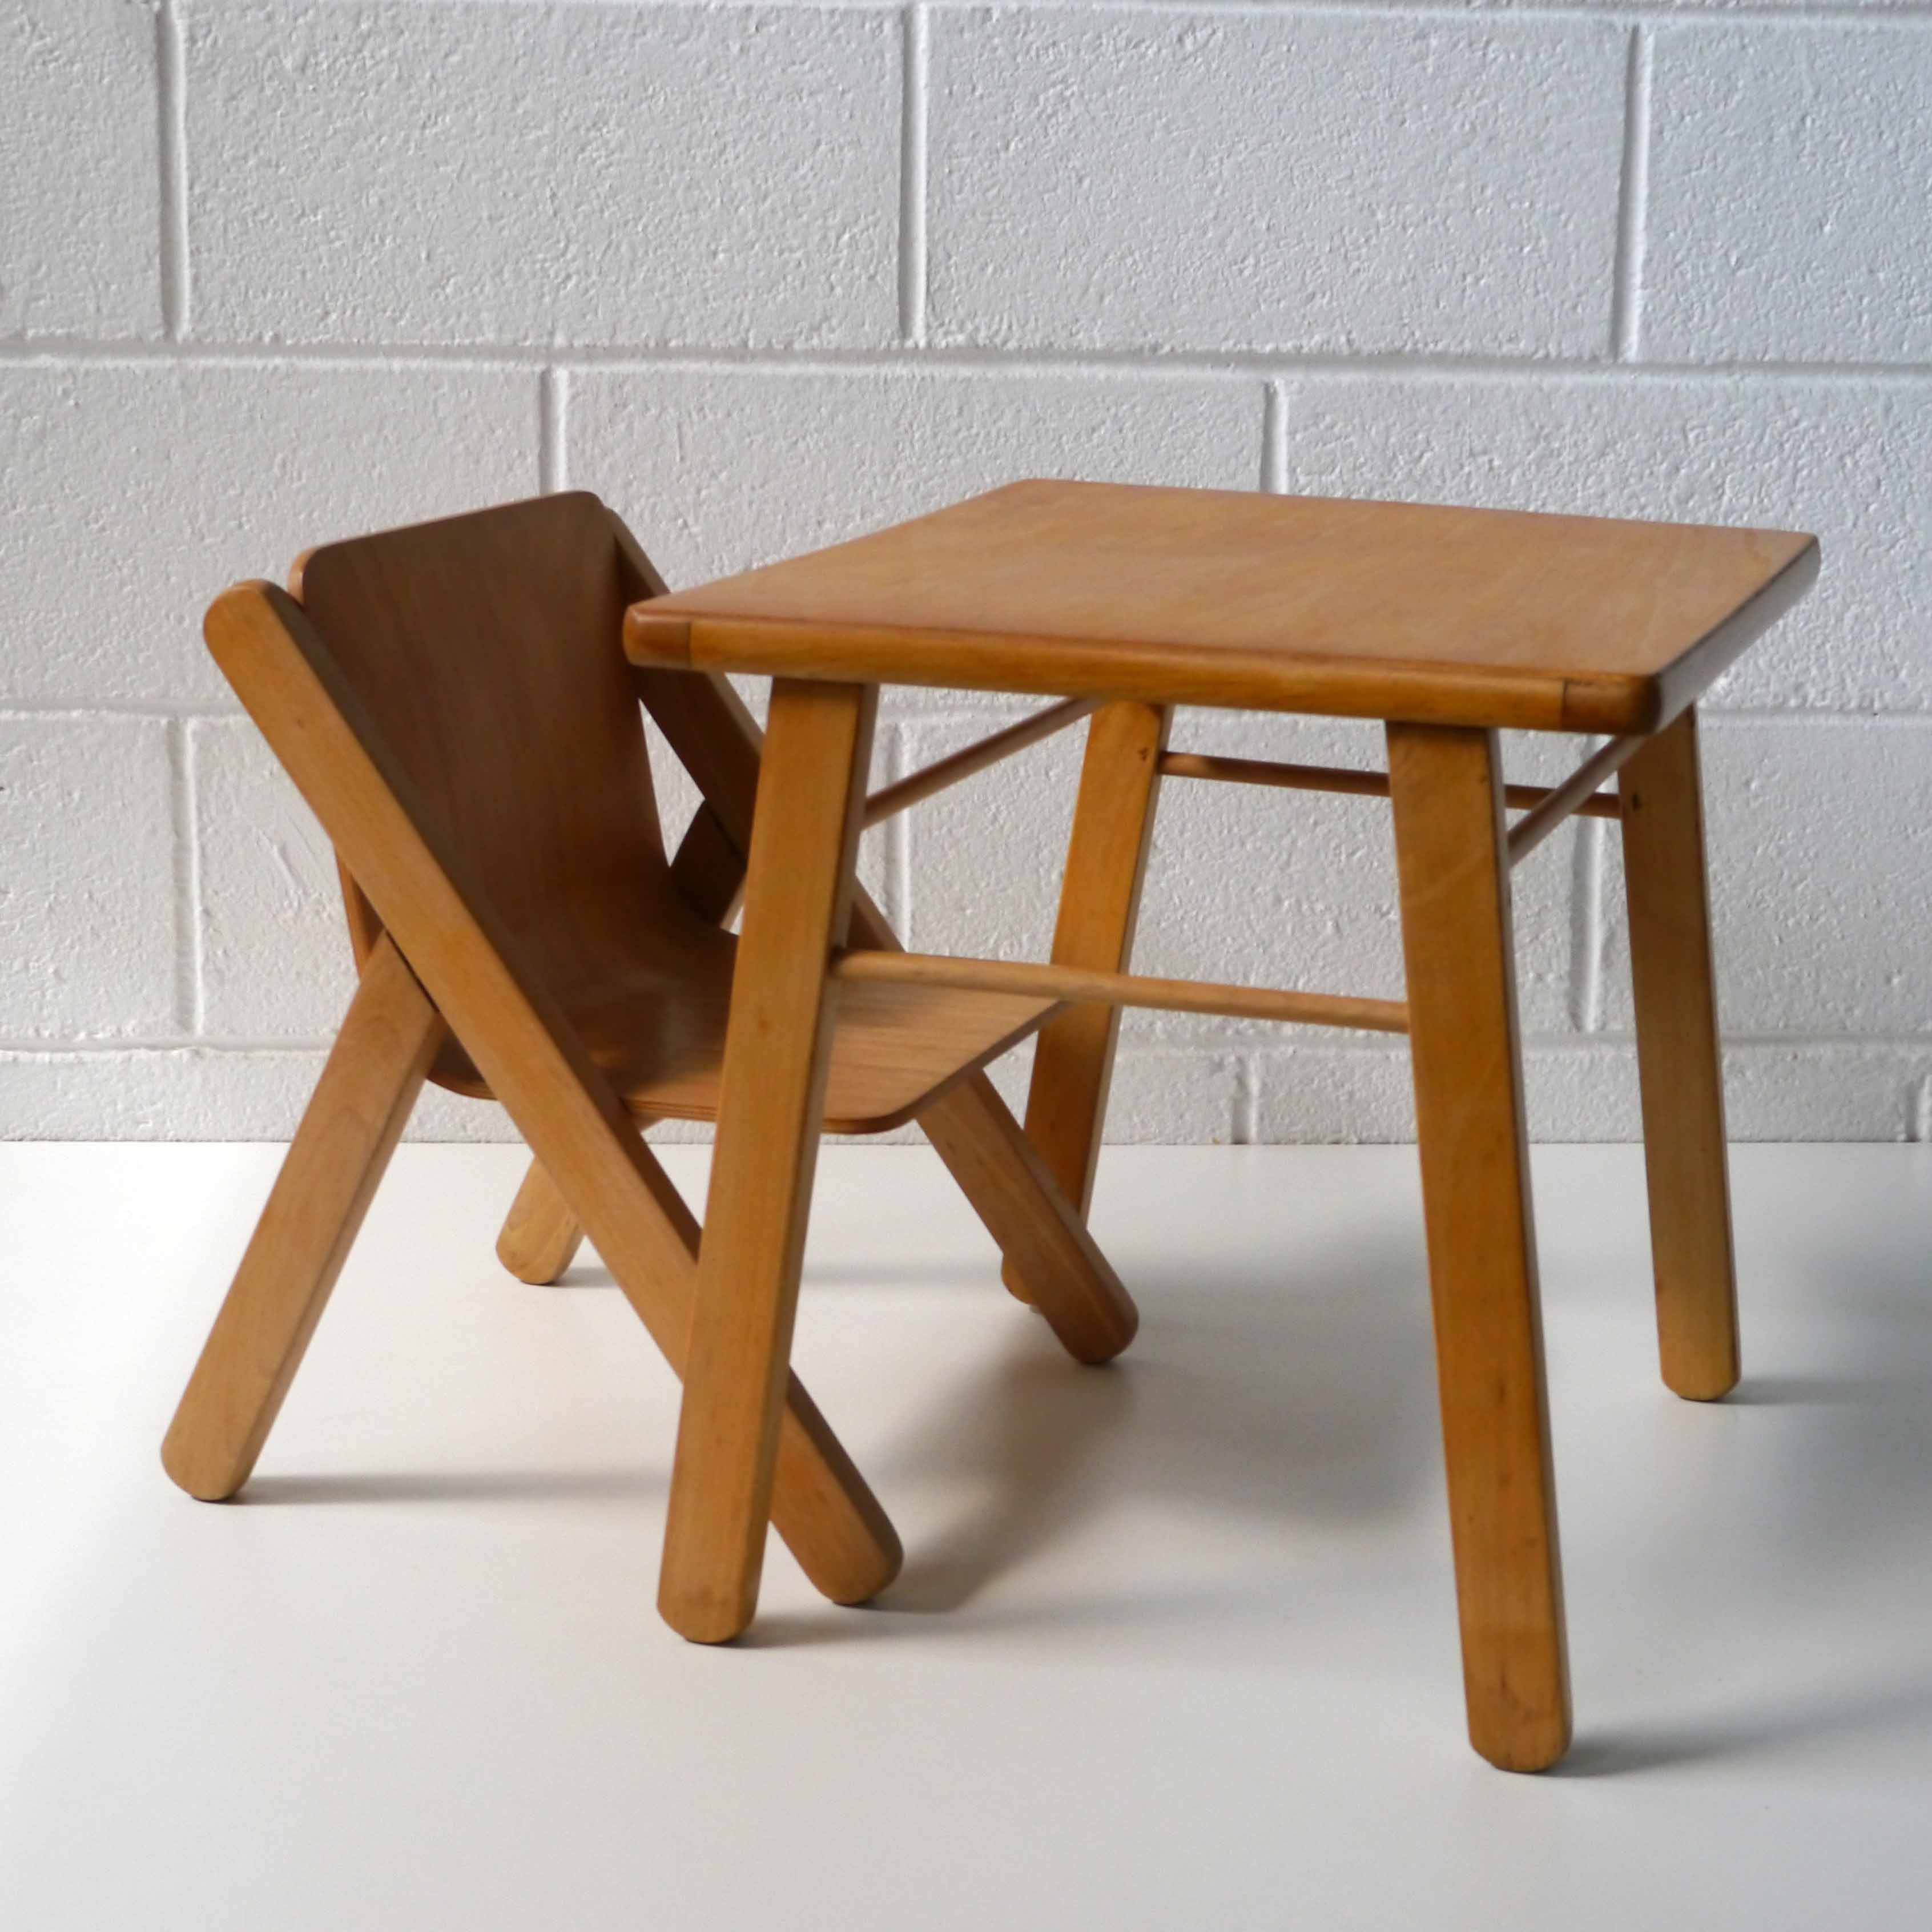 bureau enfant design la marelle mobilier vintage pour enfant. Black Bedroom Furniture Sets. Home Design Ideas